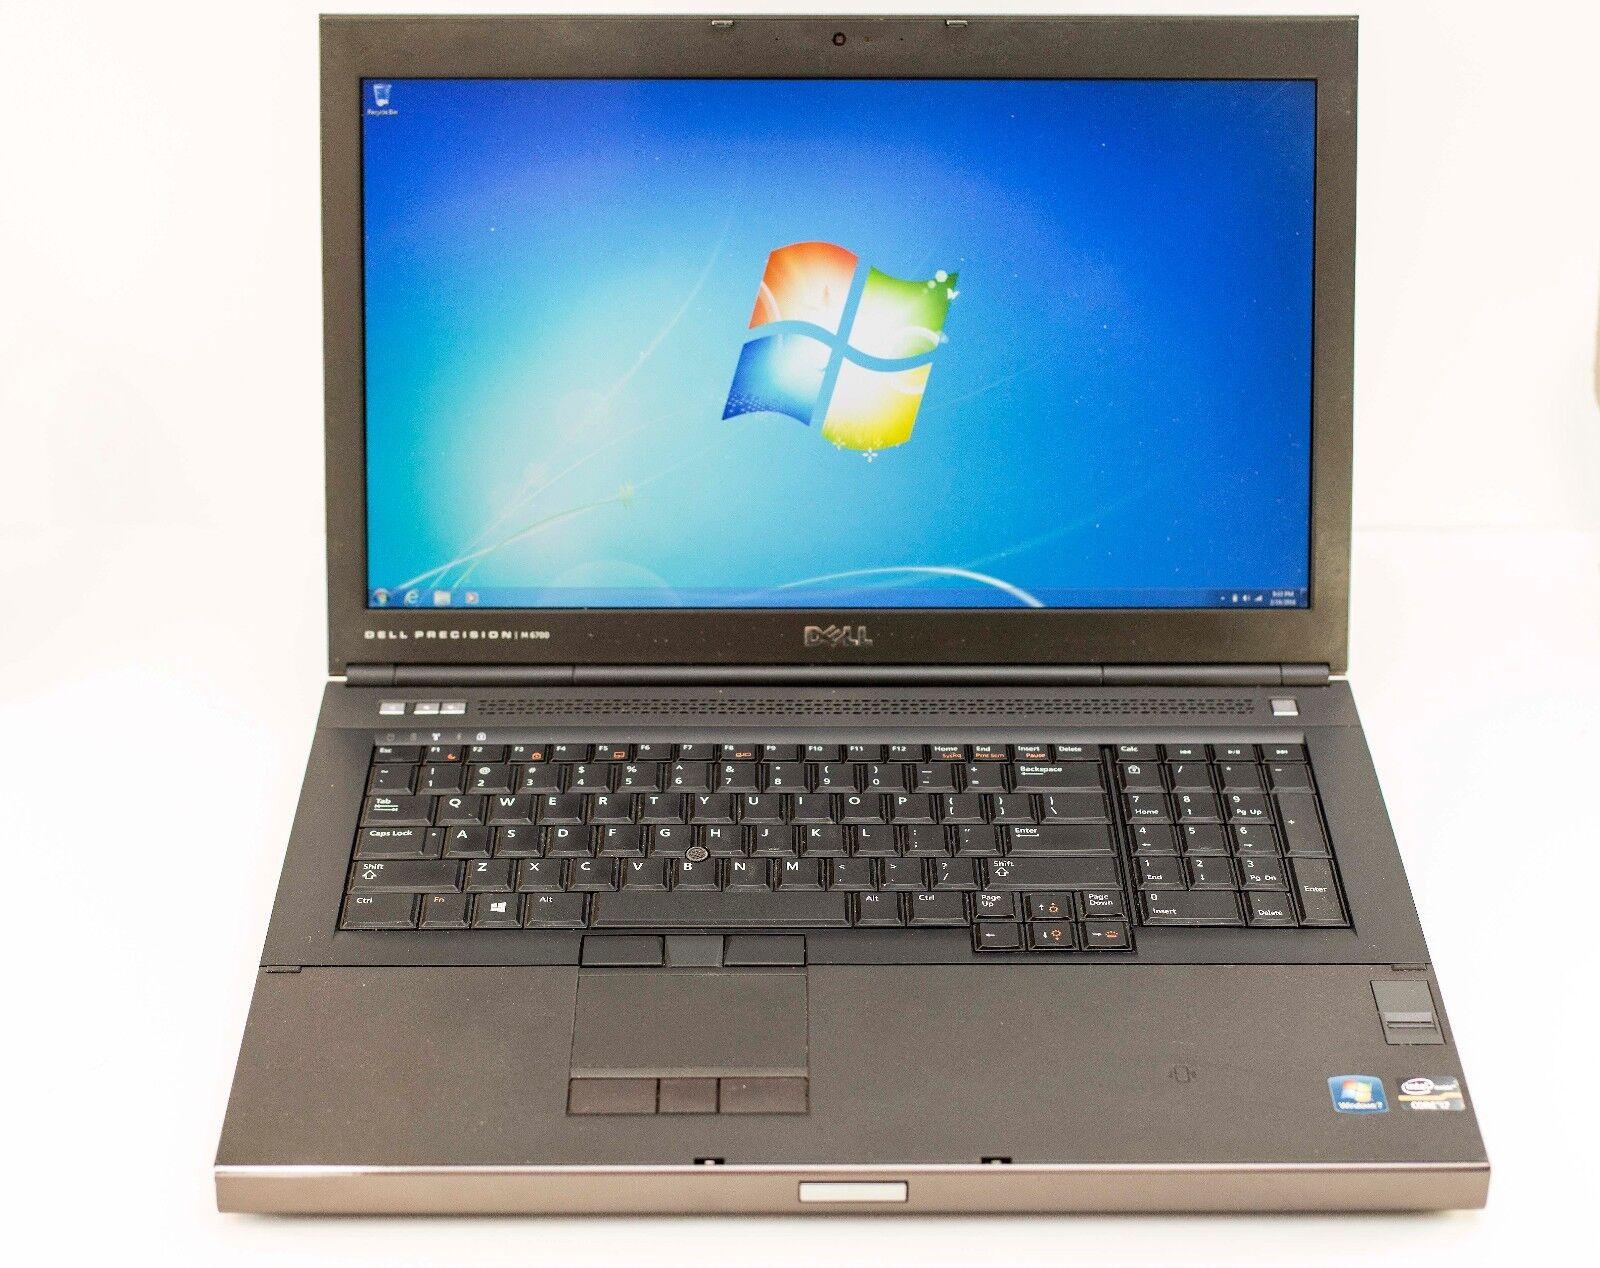 "Dell Precision M6700 17"" i7-3740QM 2.7GHz 16GB 180GB SSD K4000m Gaming W7 Laptop"